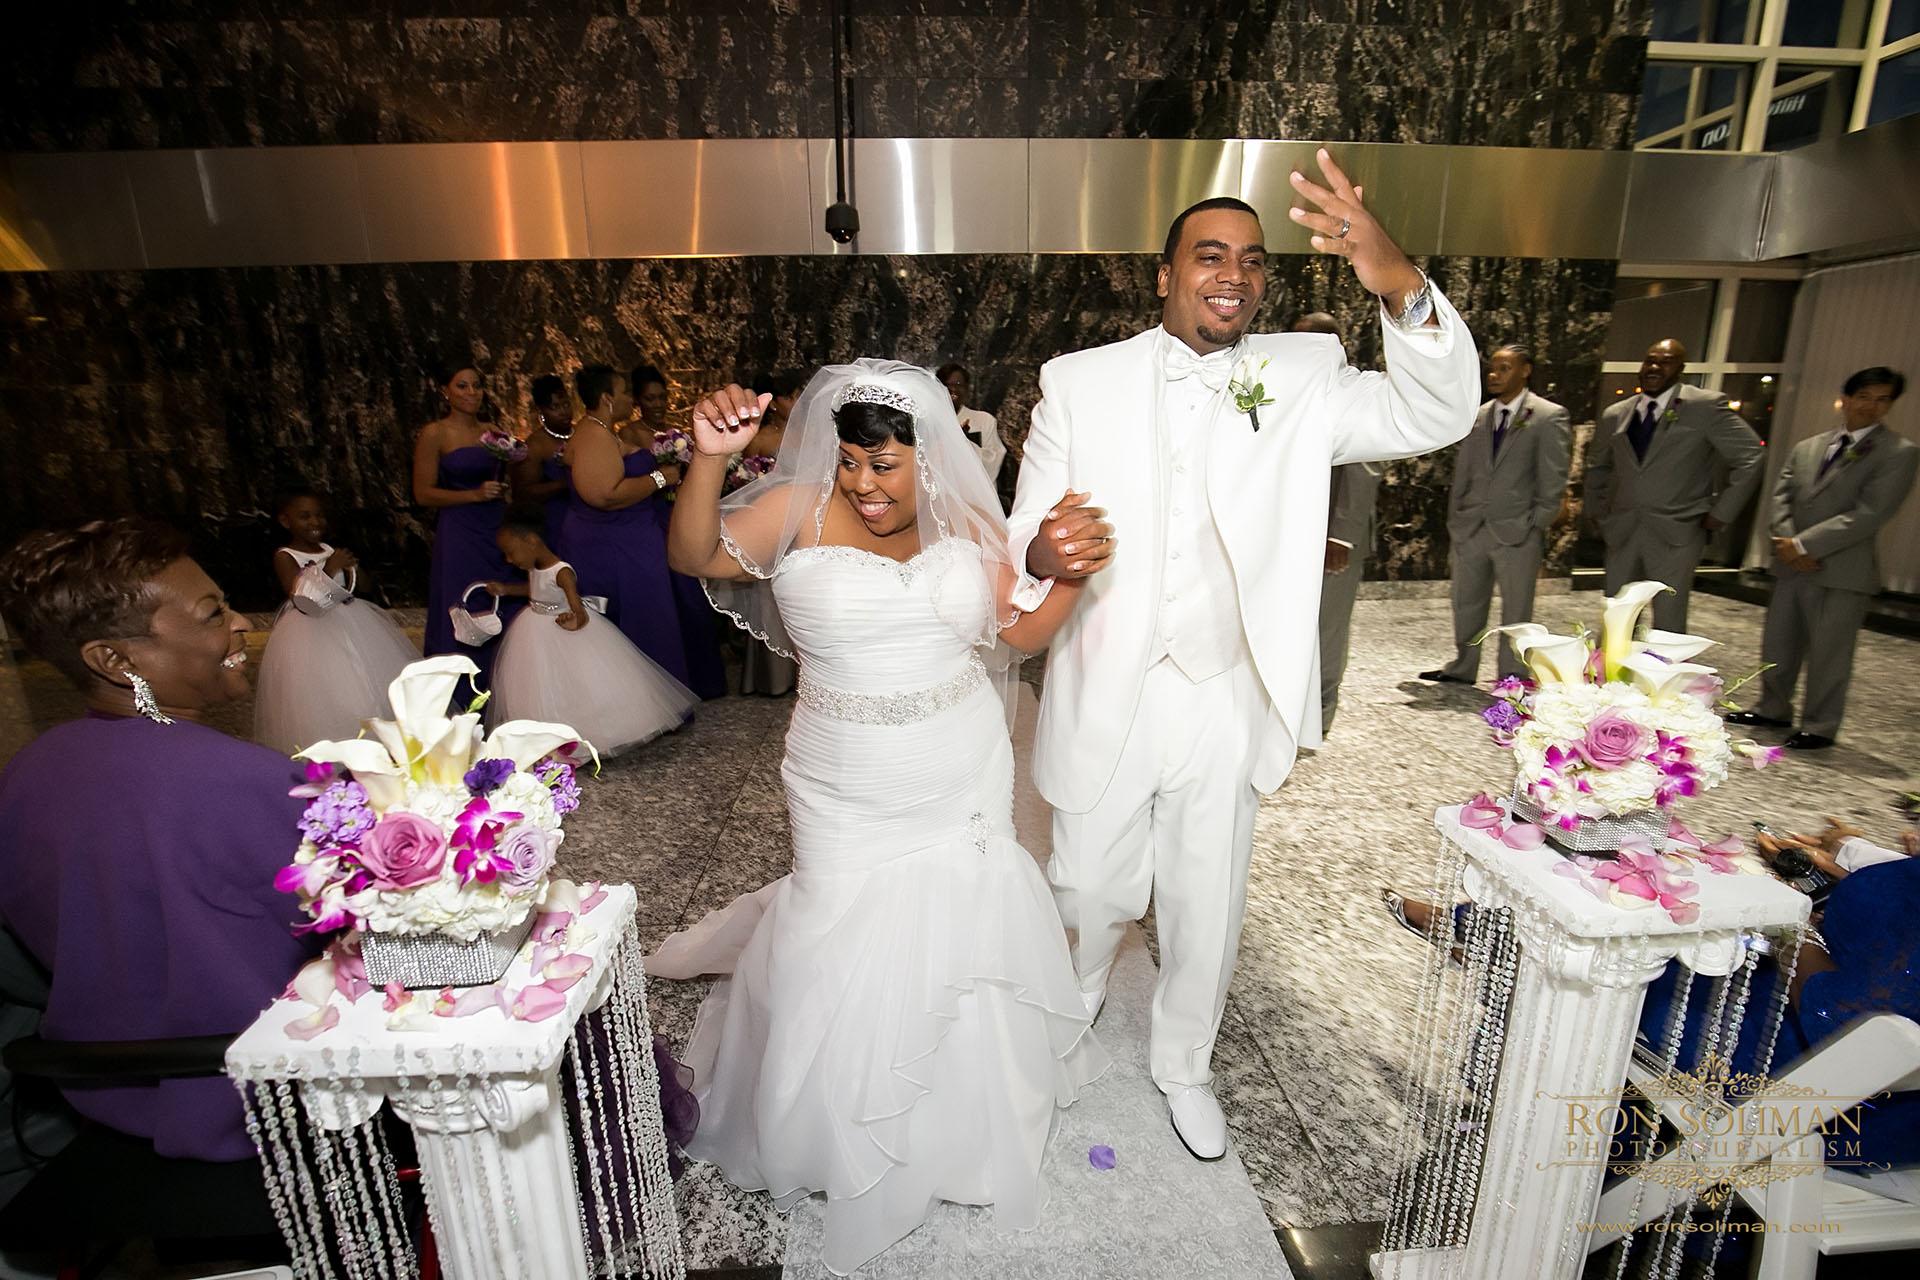 METROPOLITAN ROOM WEDDING 16